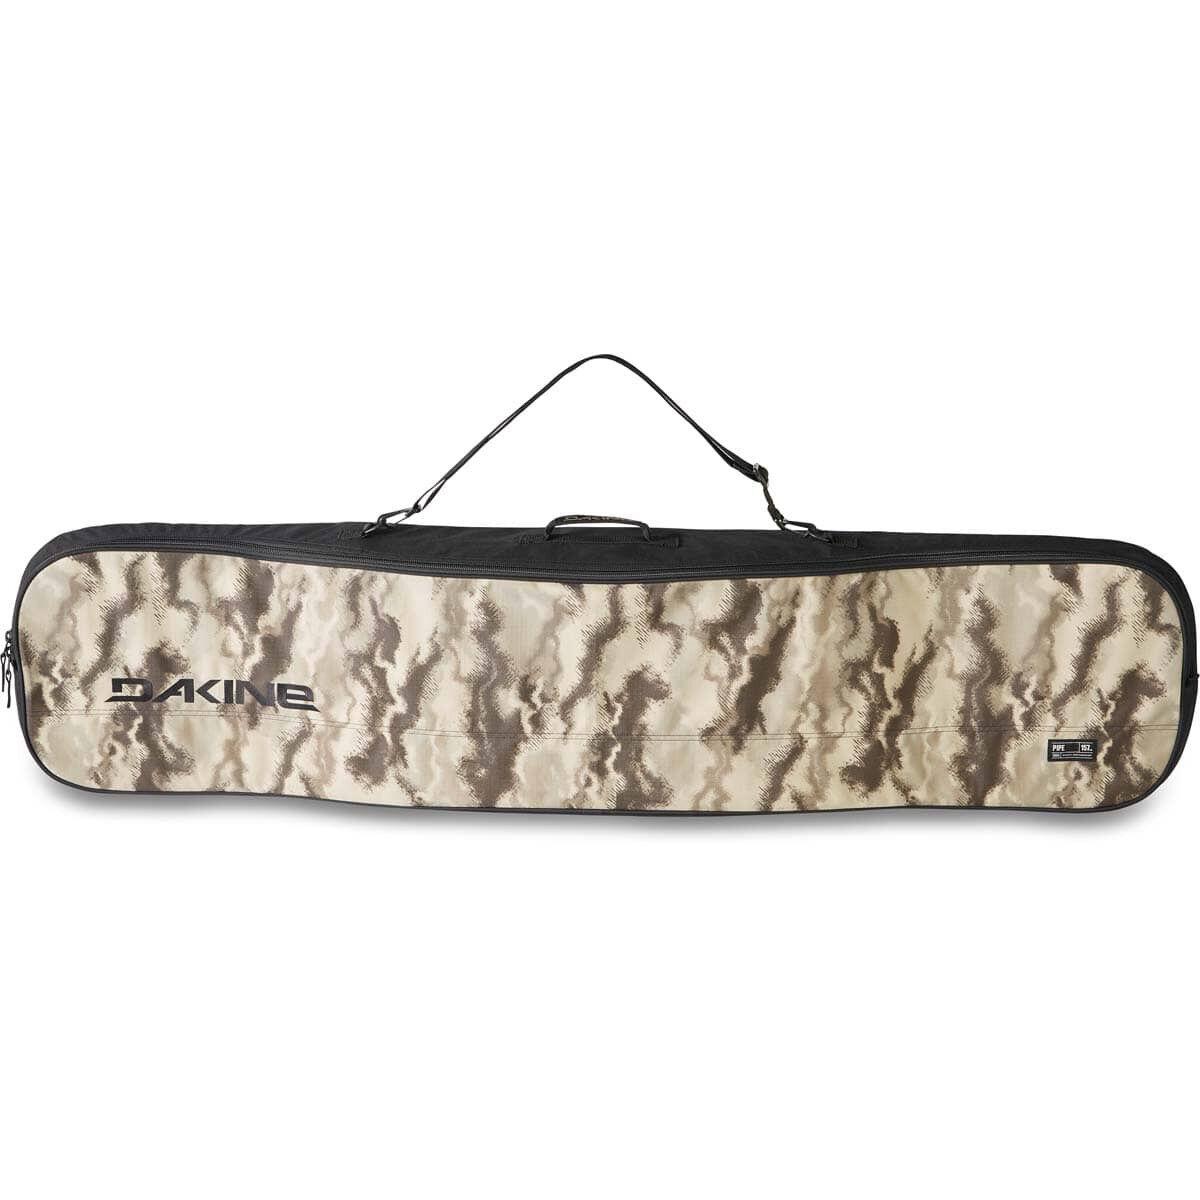 Dakine Pipe Snowboard Bag 157 cm Snowboard Boardbag Ashcroft Camo